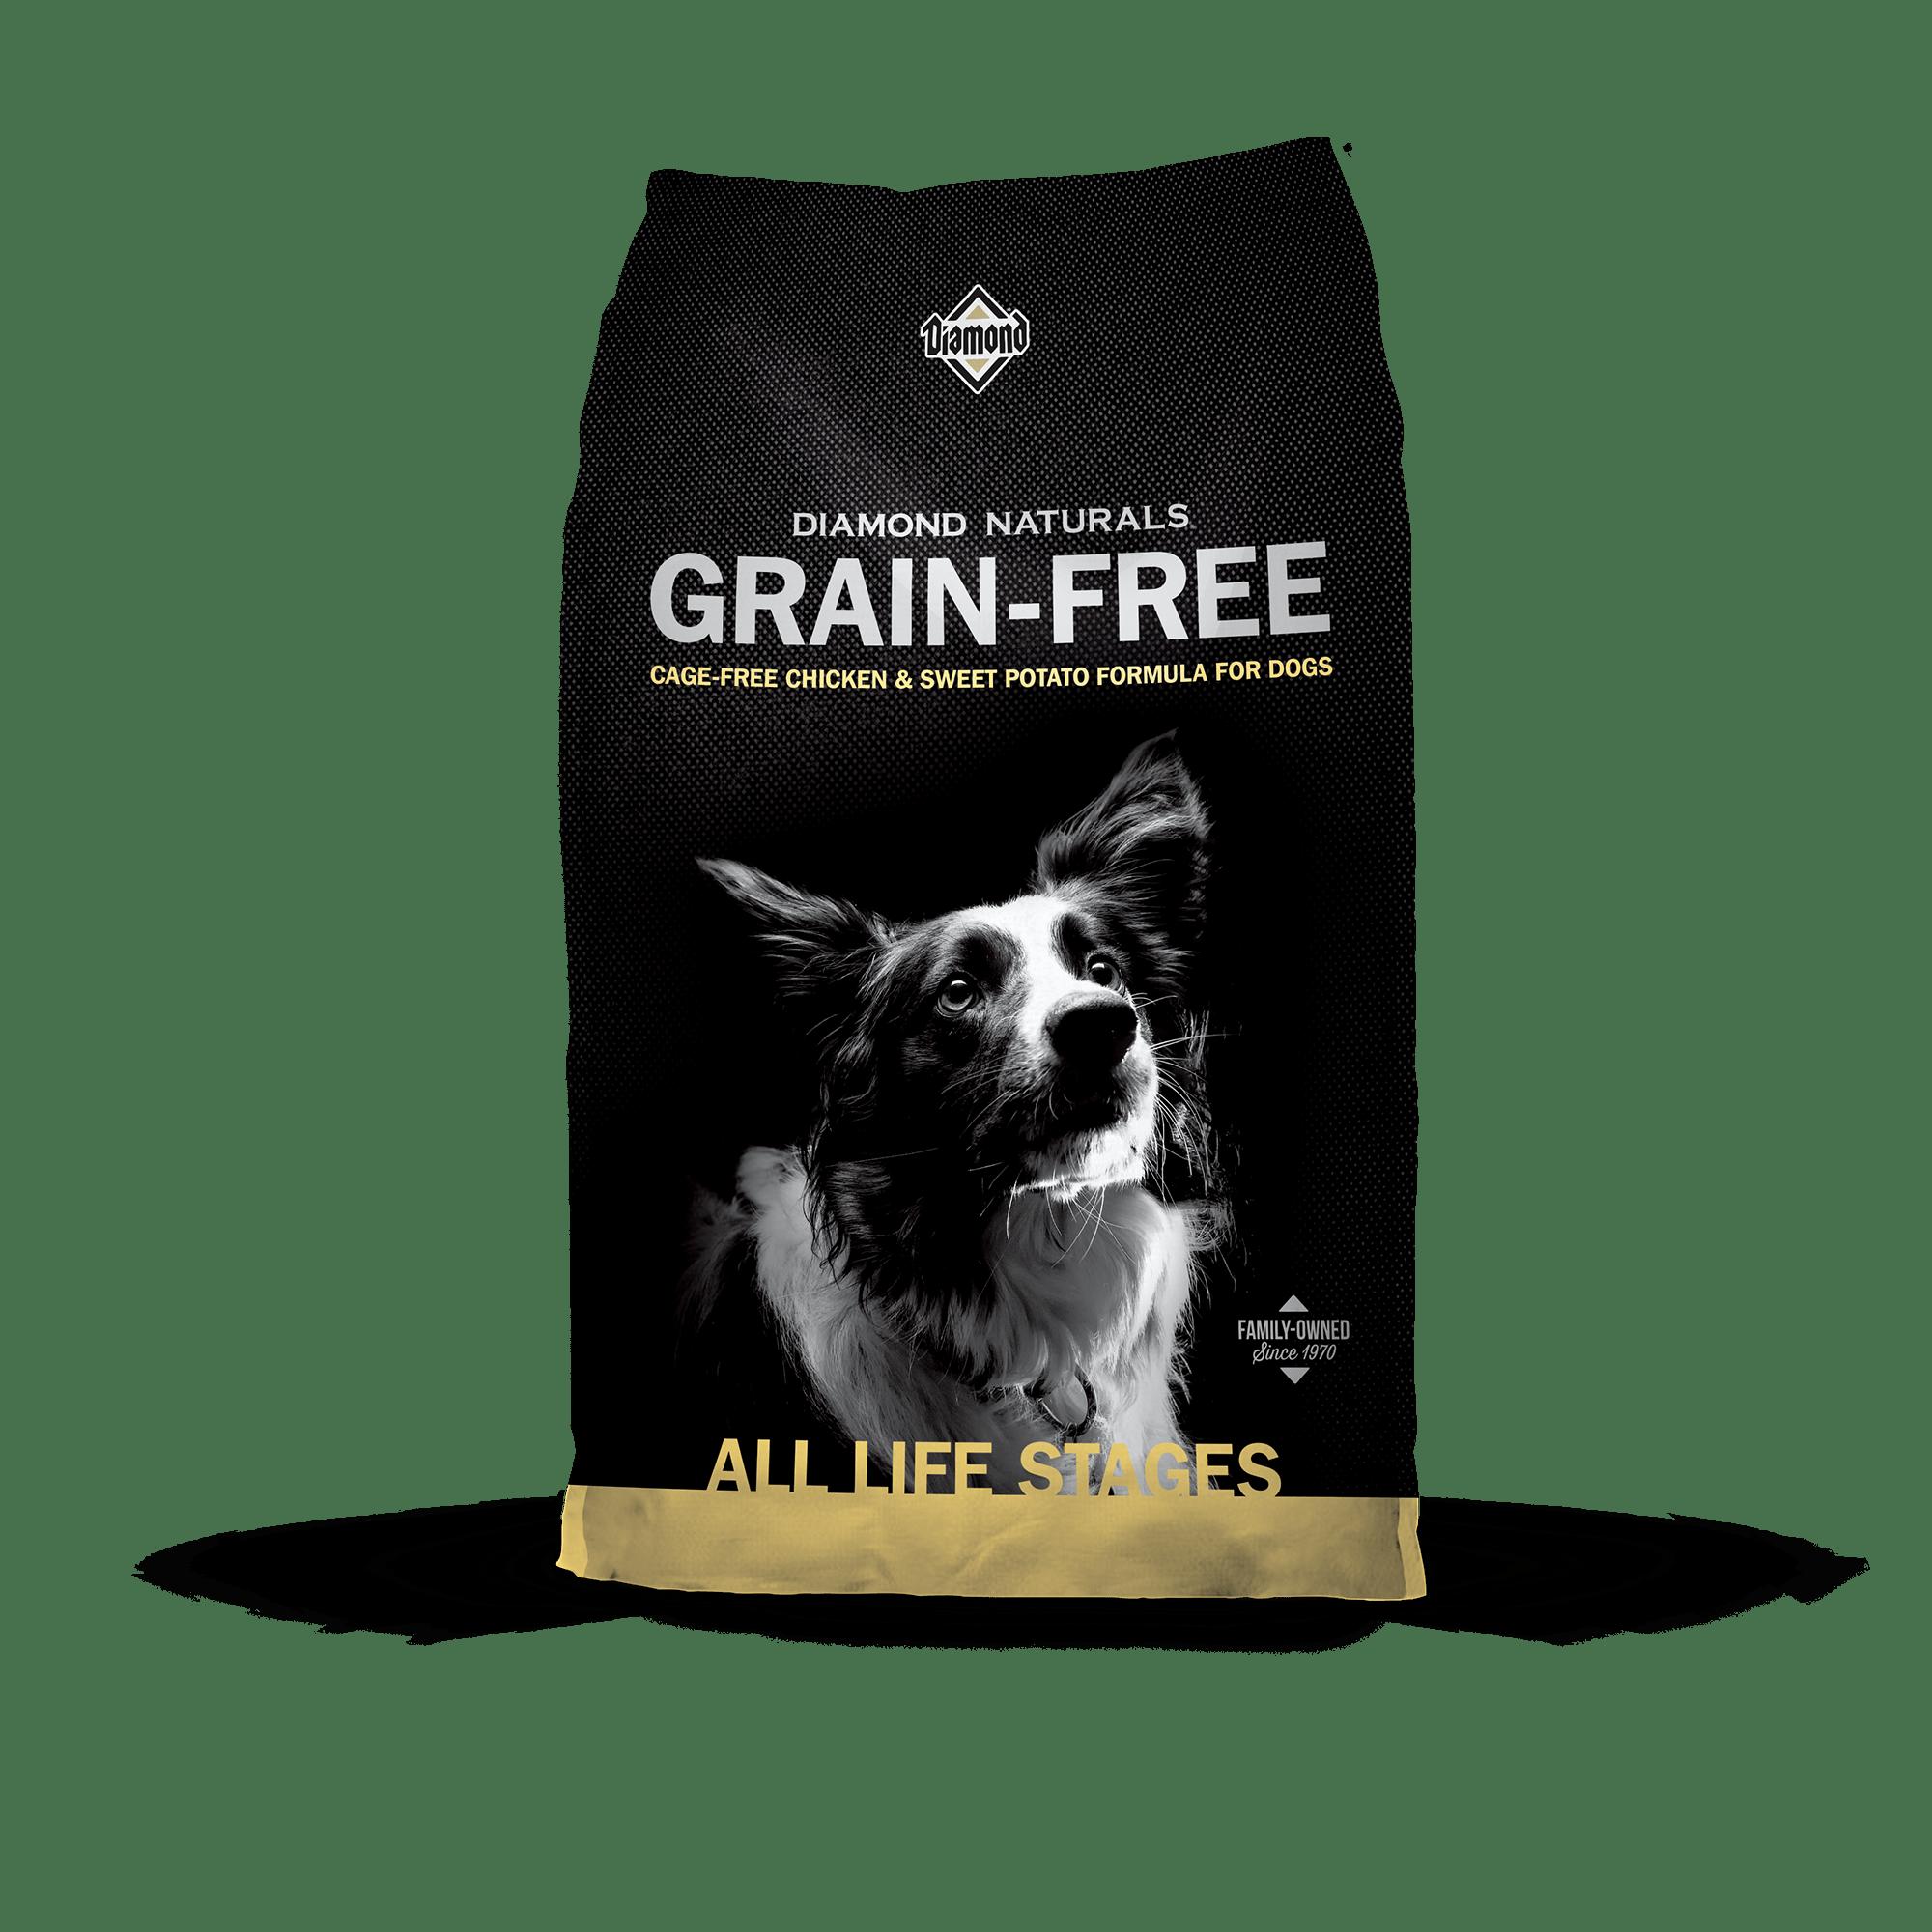 Diamond Naturals Grain-Free Cage-Free Chicken bag